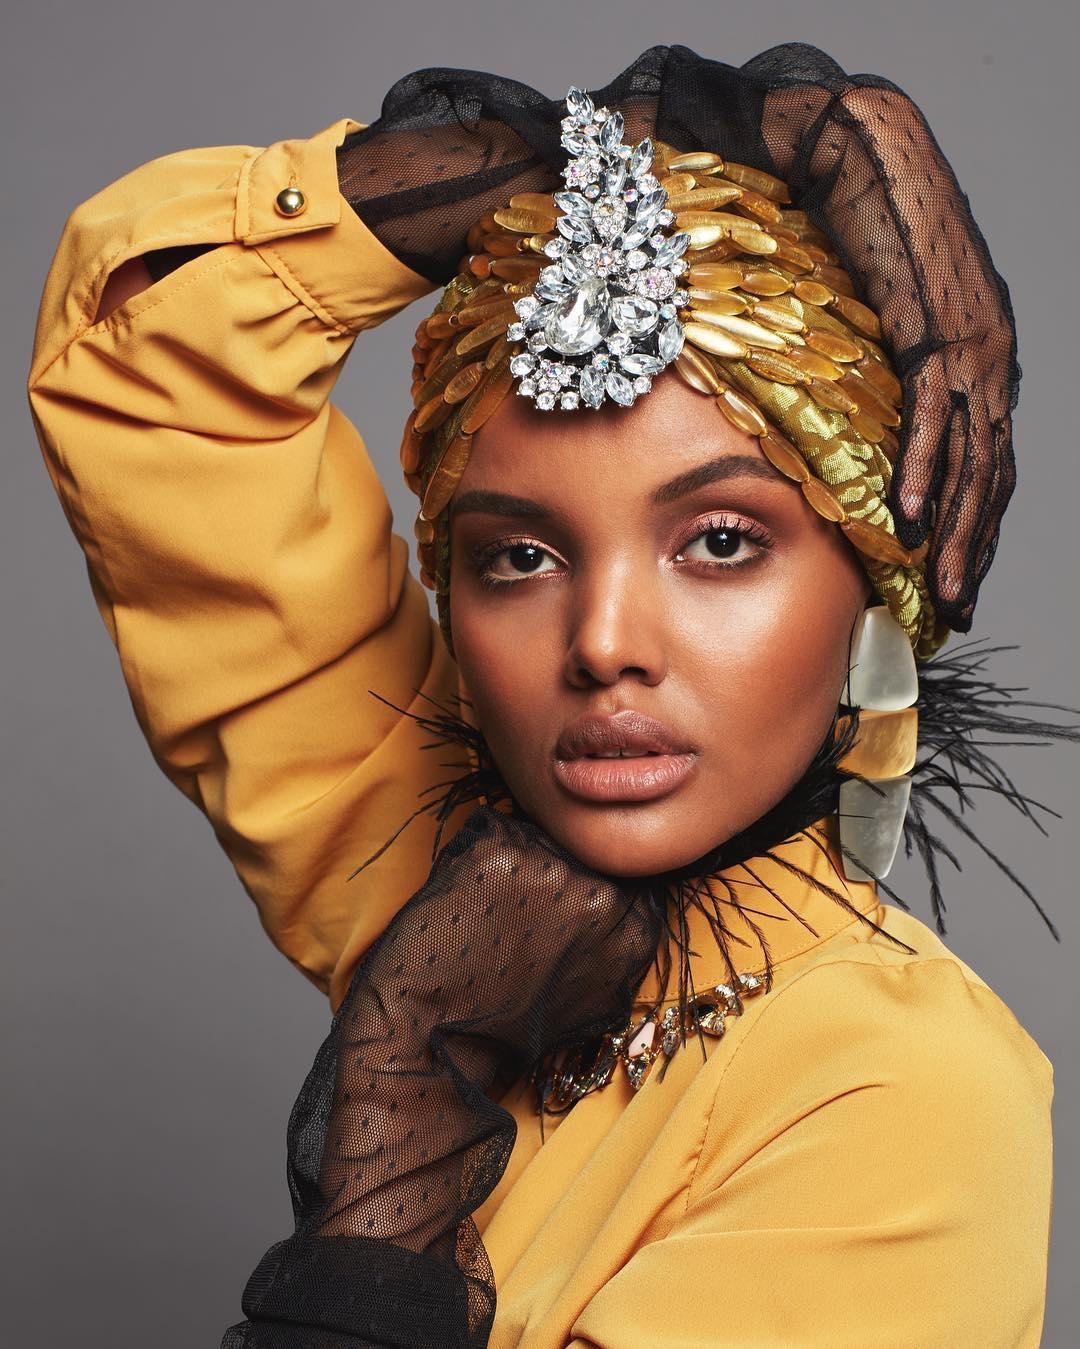 halima-aden-headshot-muslim-hijab-model